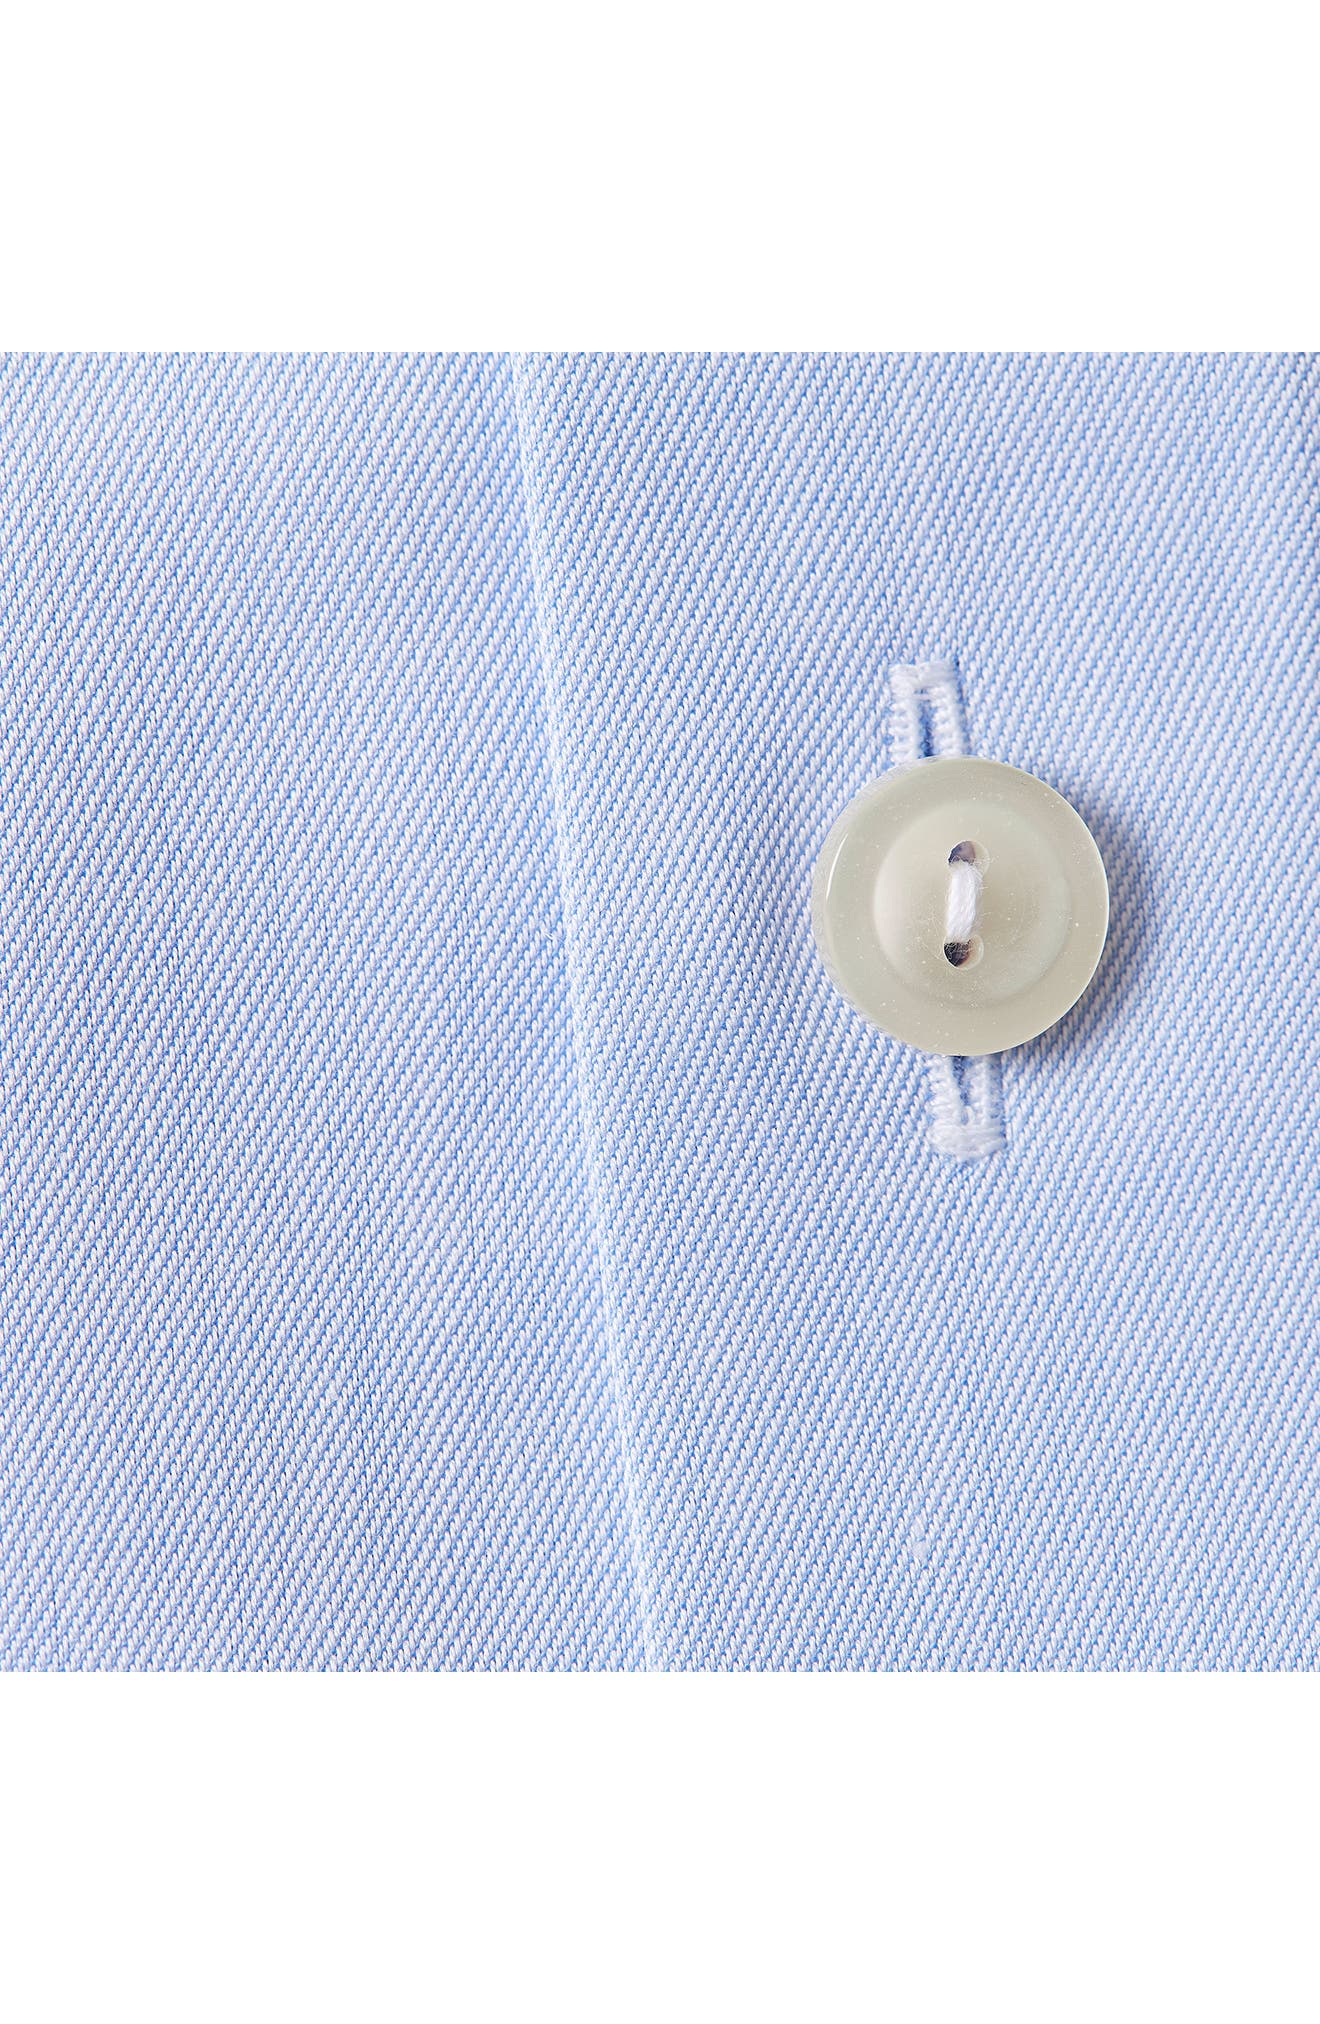 Alternate Image 3  - Eton Classic Fit Twill Dress Shirt